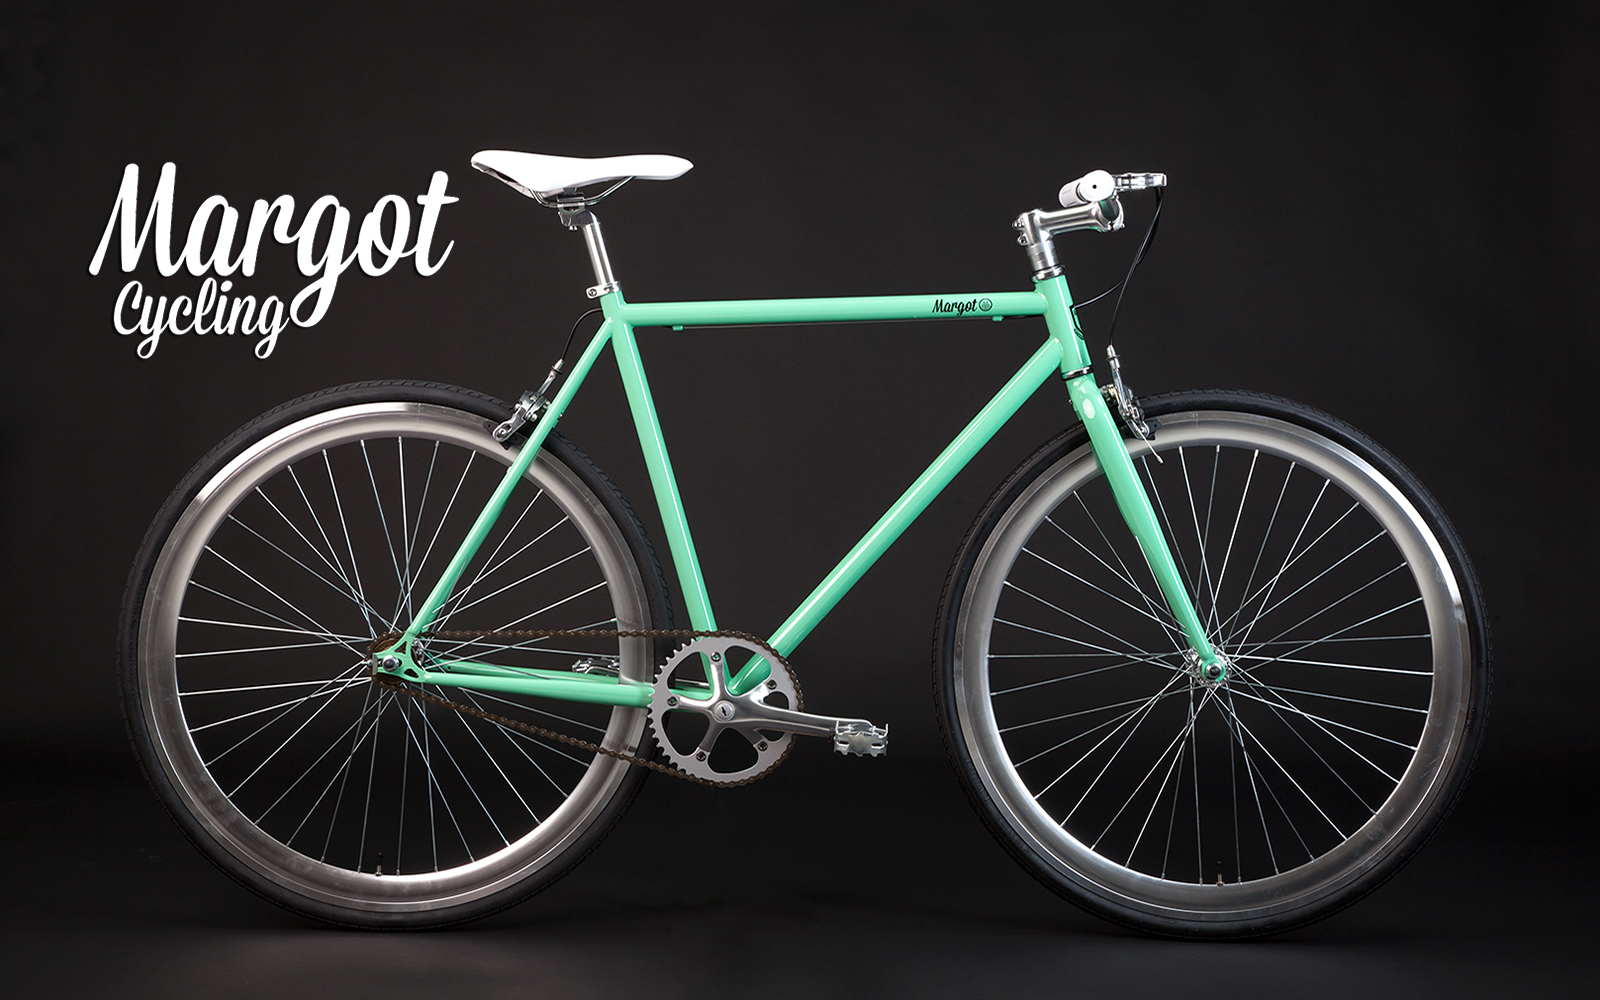 Tiffany: bicicletta fissa vintage, elegante e retrò.